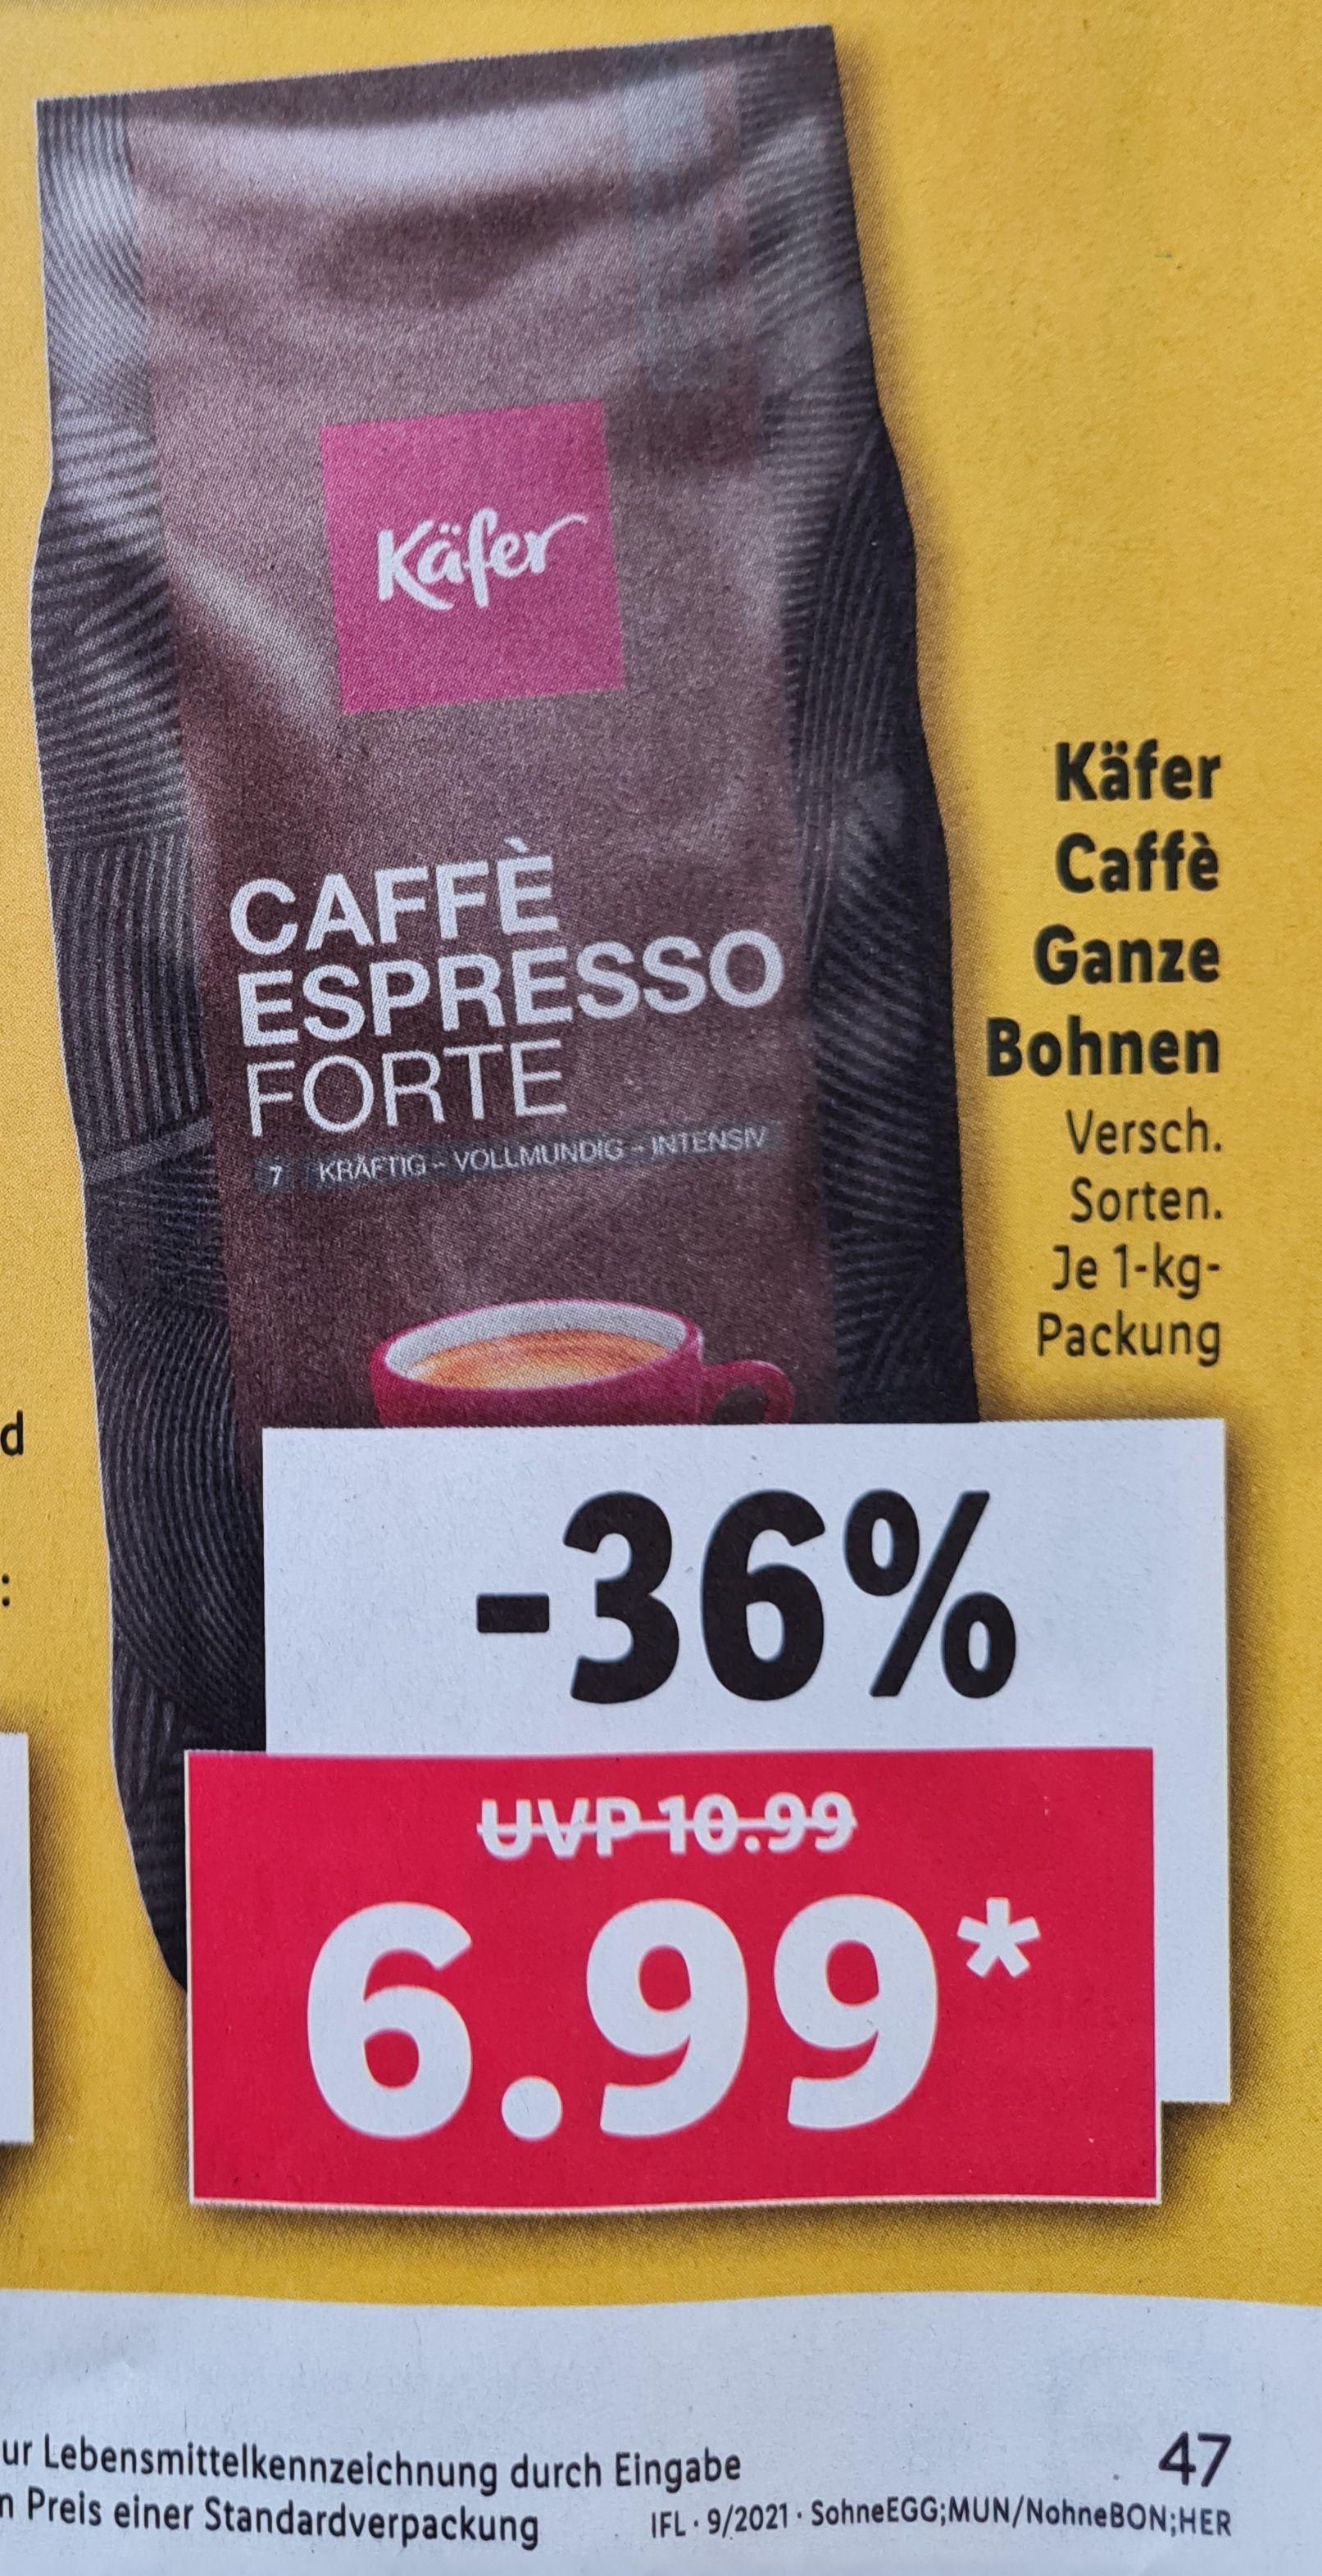 Käfer Caffé Ganze Bohnen 1 Kg verschiedene Sorten Lidl ab 05.03